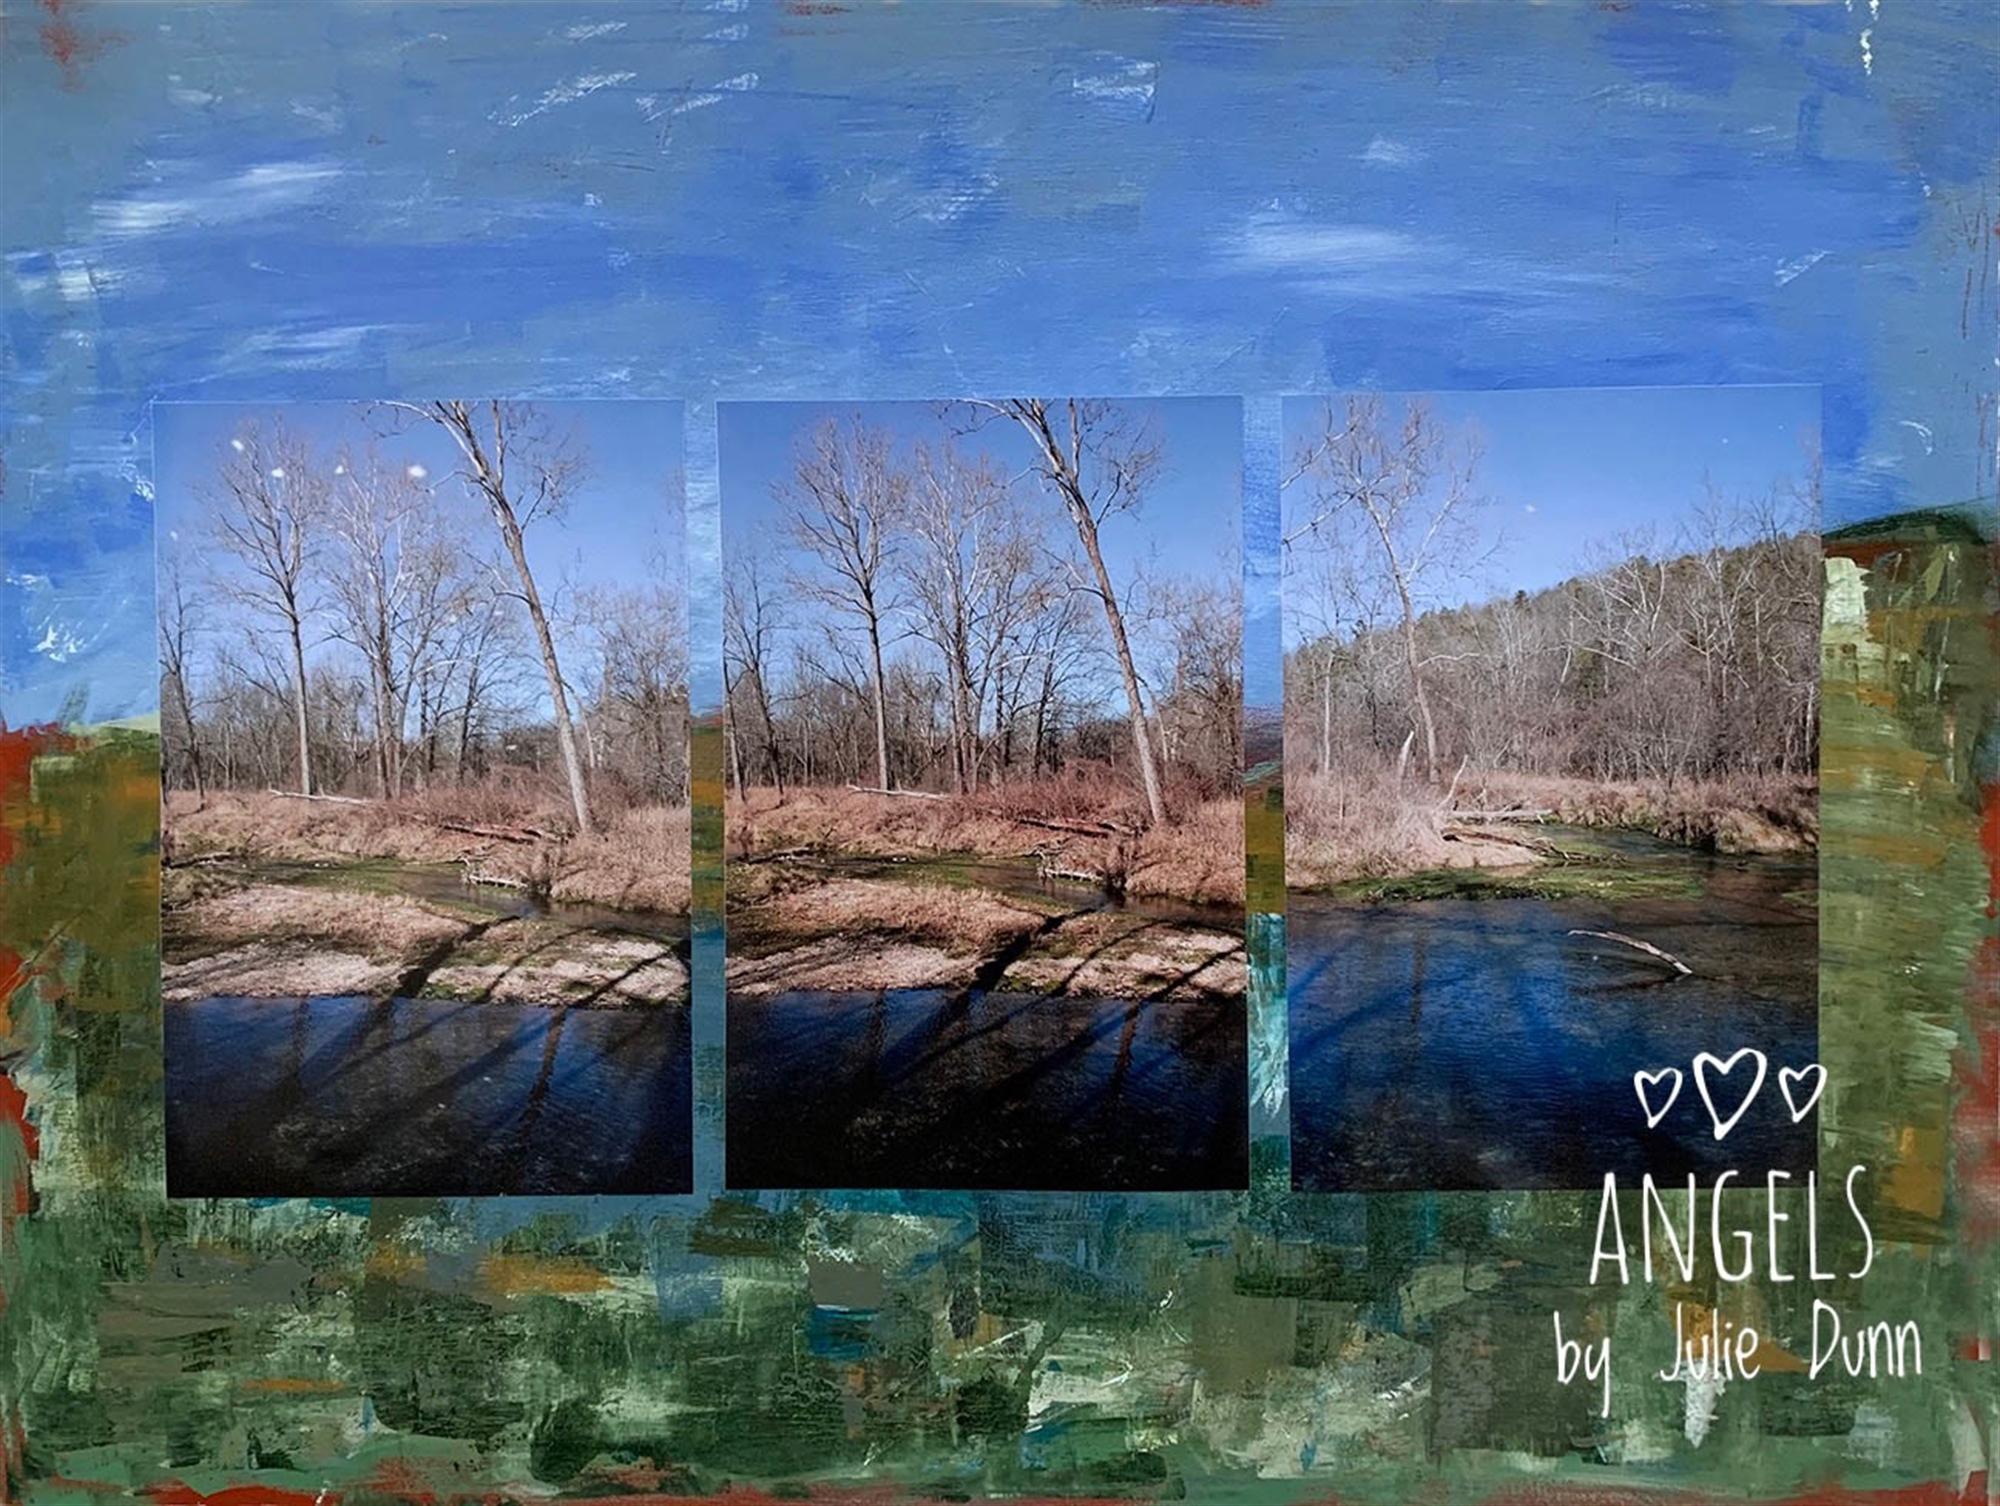 Angels by Julie Dunn